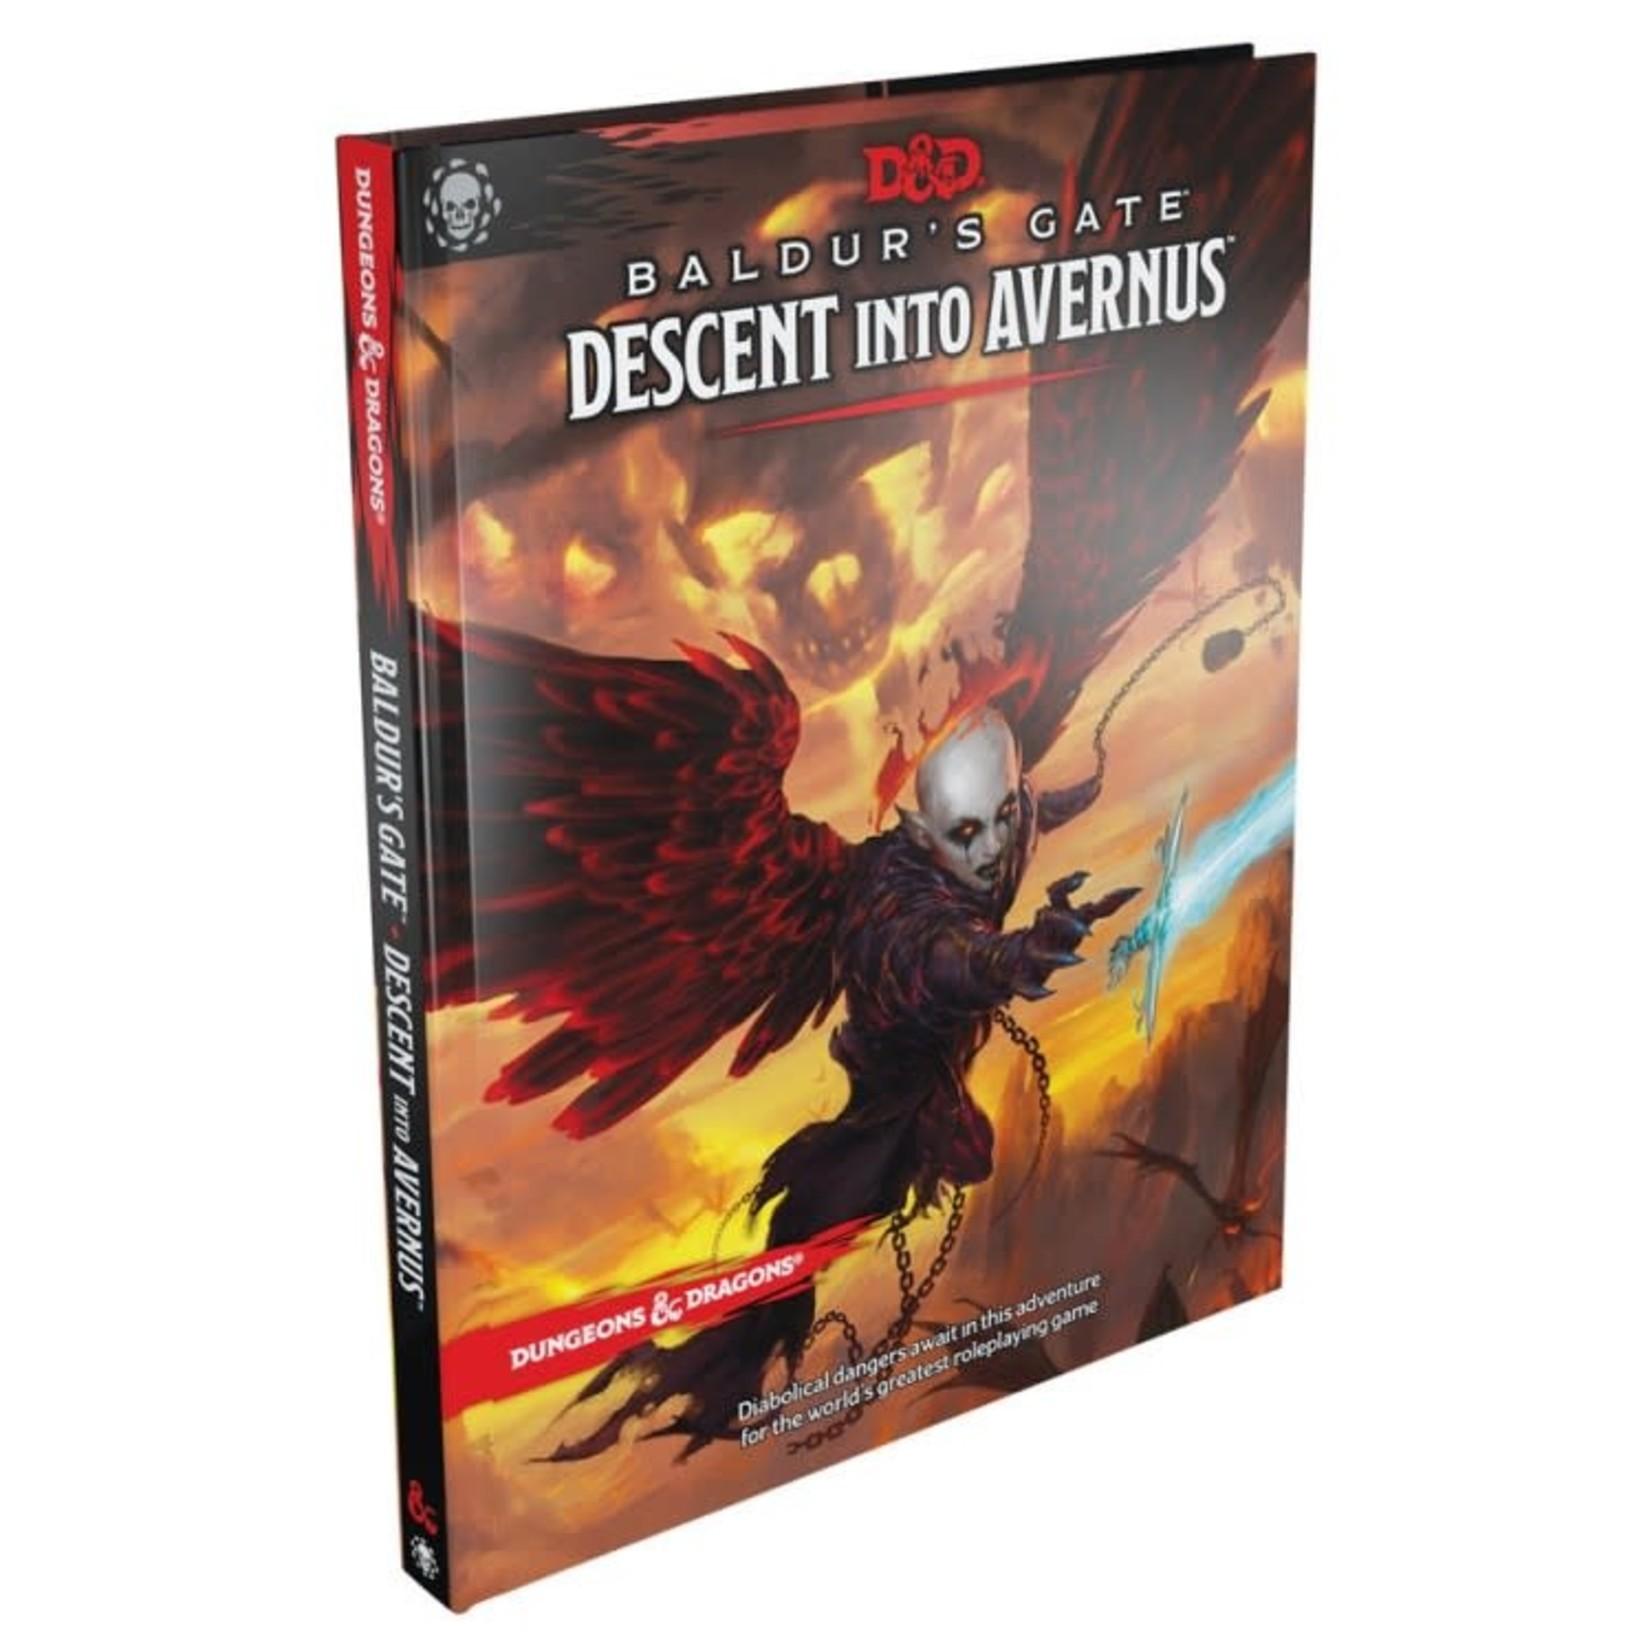 Wizards of the Coast D&D 5th Ed Baldur's Gate - Descent into Avernus